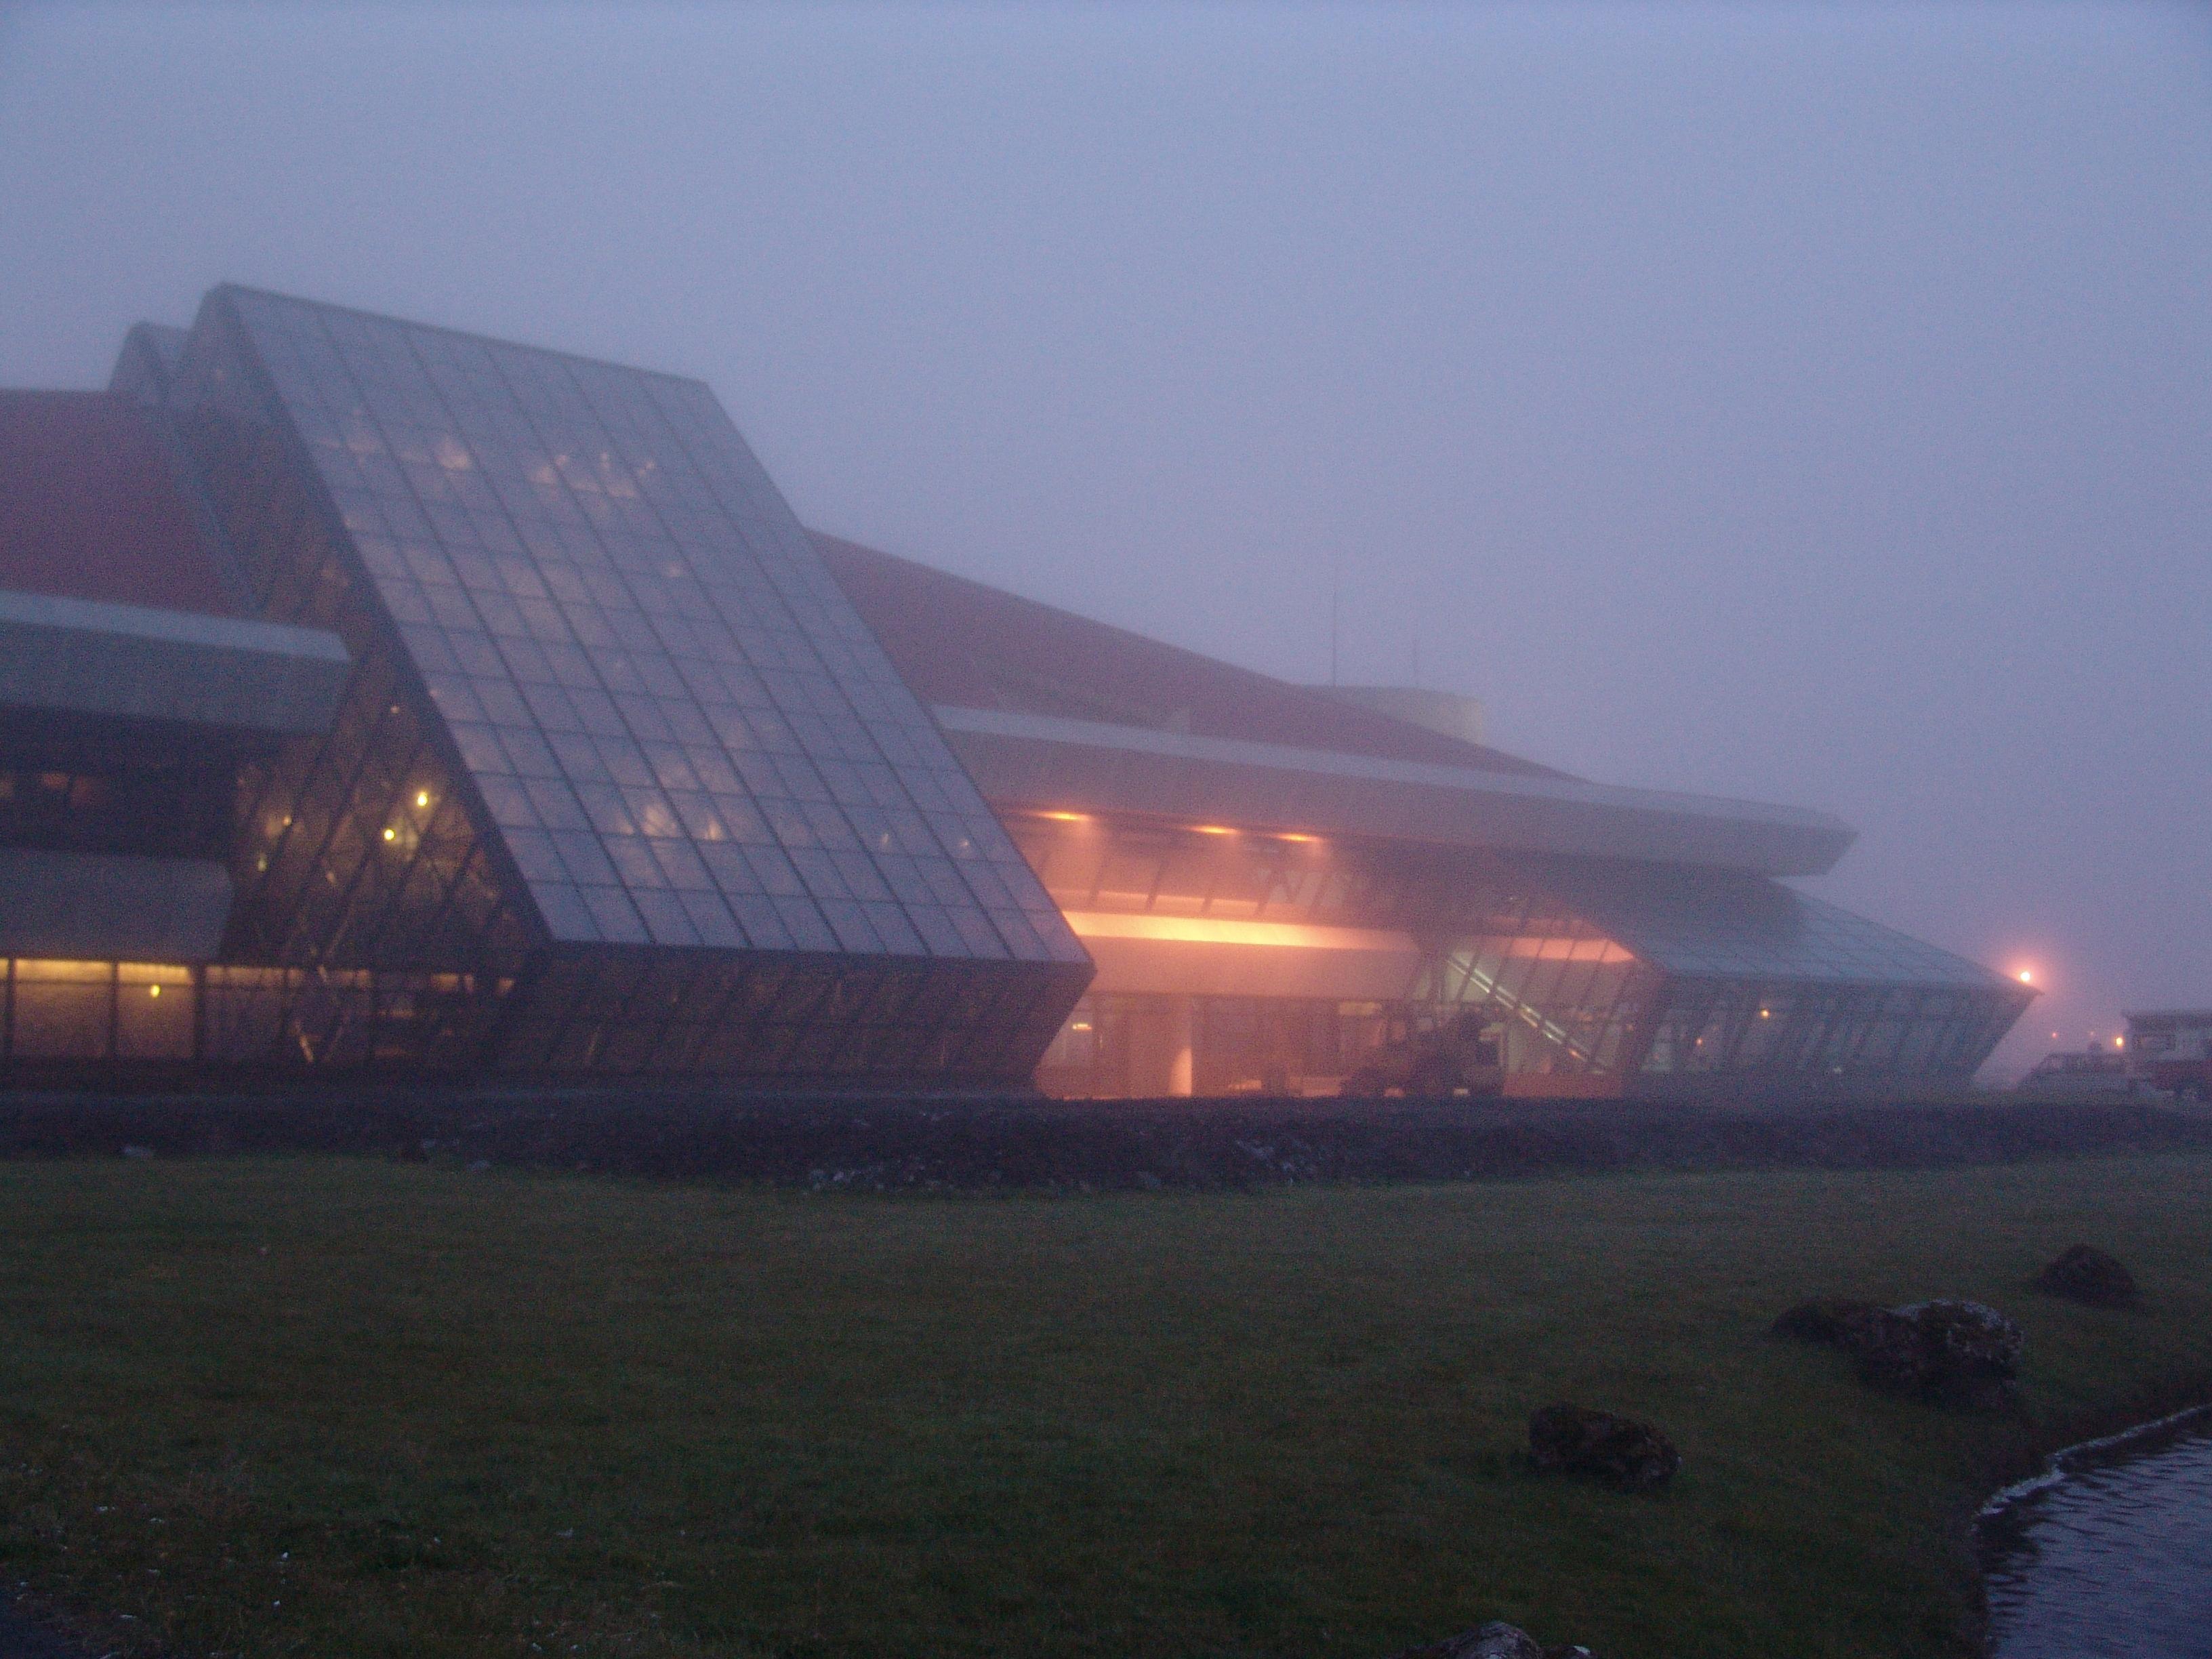 Keflavik Iceland  City pictures : Originaldatei  3.264 × 2.448 Pixel, Dateigröße: 3,35 MB, MIME ...